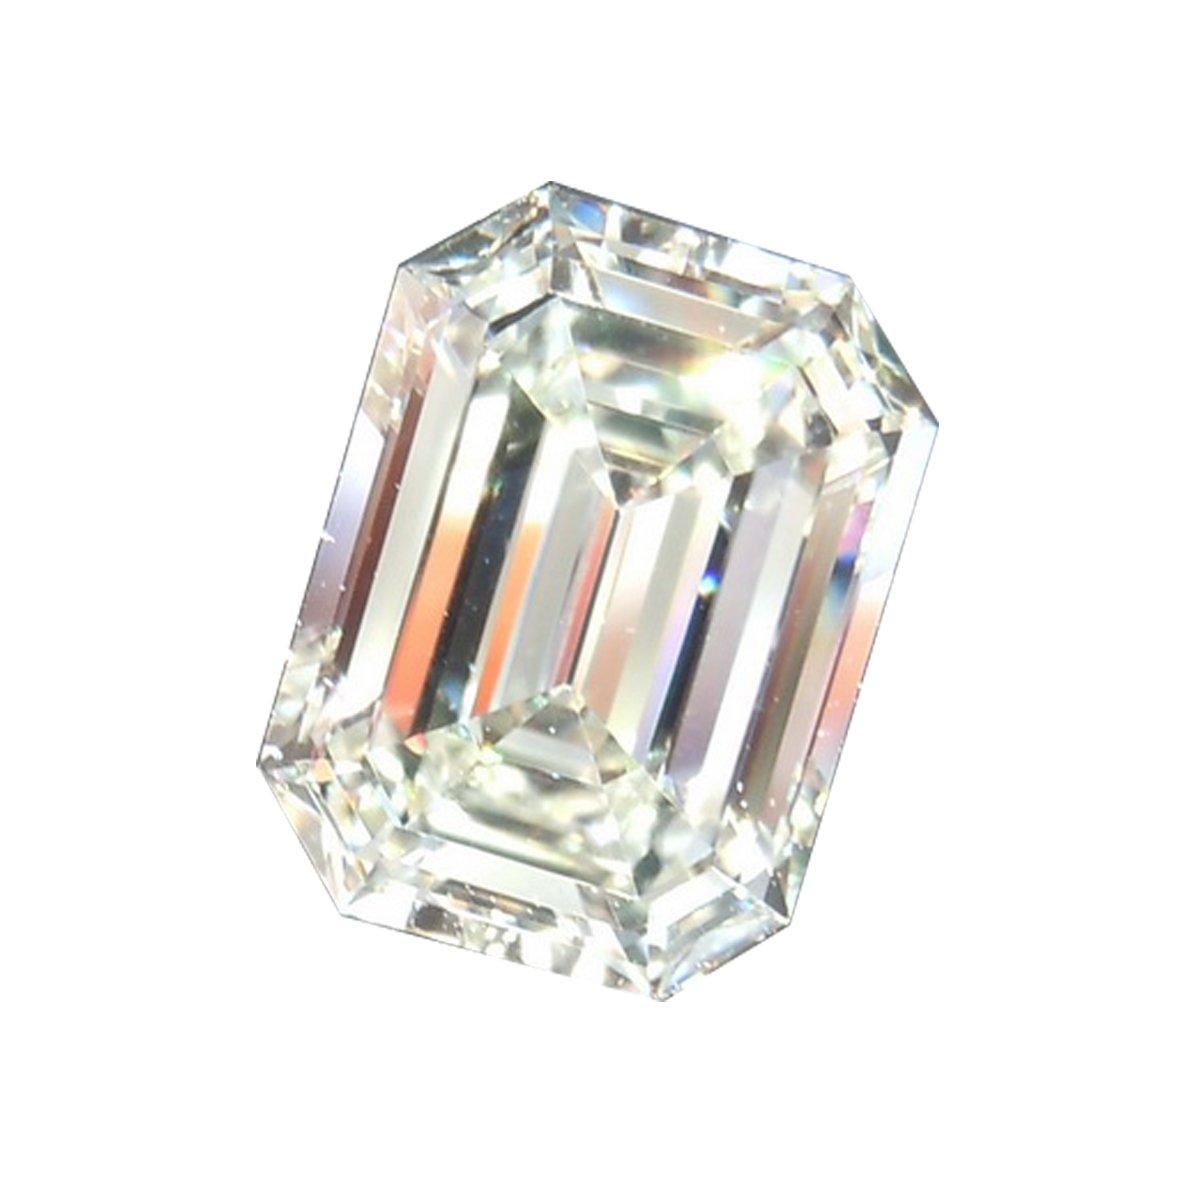 RINGJEWEL 1.66 ct VVS1 Emerald Cut Real Loose Moissanite Use 4 Pendant/Ring Genuine White I-J Color by RINGJEWEL